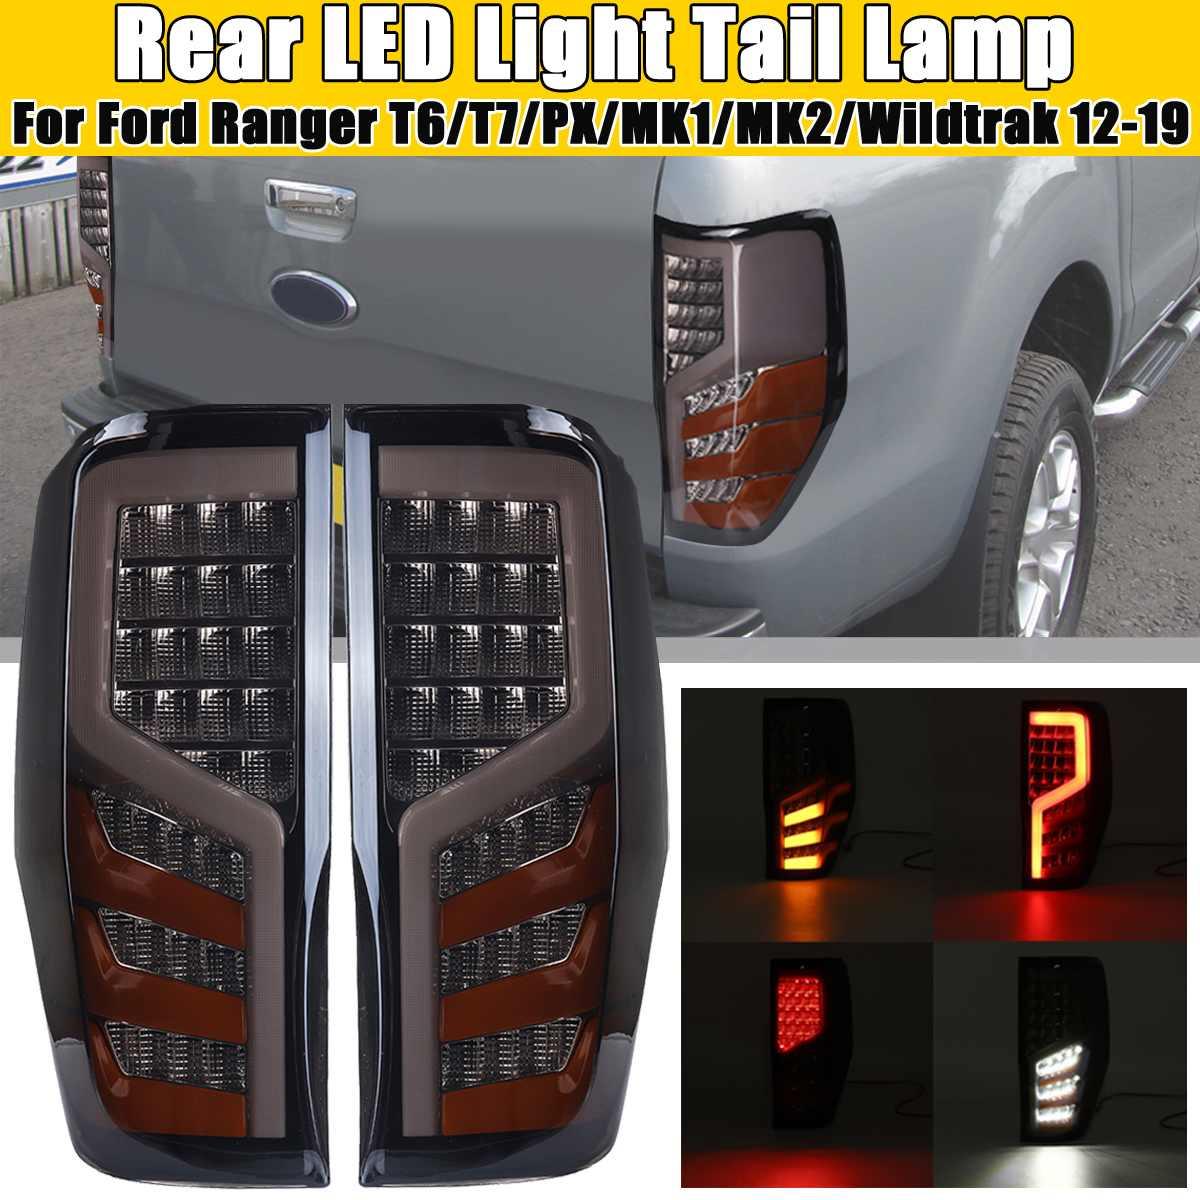 Pair Car LED Rear Tail Light Assembly Red for FORD RANGER RAPTOR T6/T7/PX/MK1/MK2/WILDTRAK 2012 2013 14-2019 Car Light Assembly